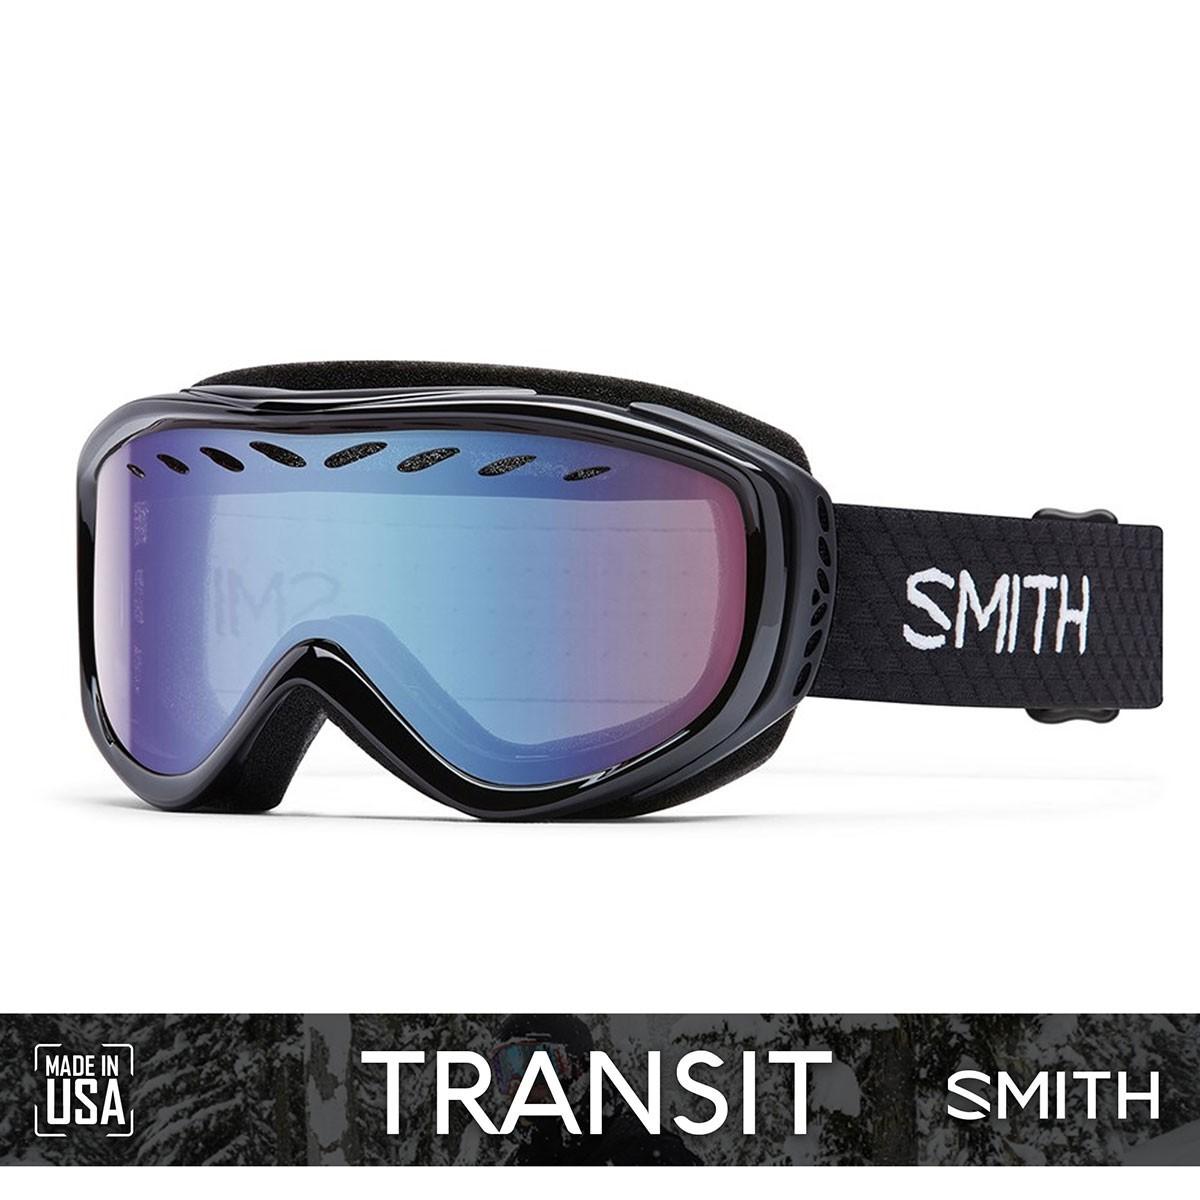 SMITH TRANSIT Black | S2 RED Sensor Mirror - Изображение - AQUAMATRIX